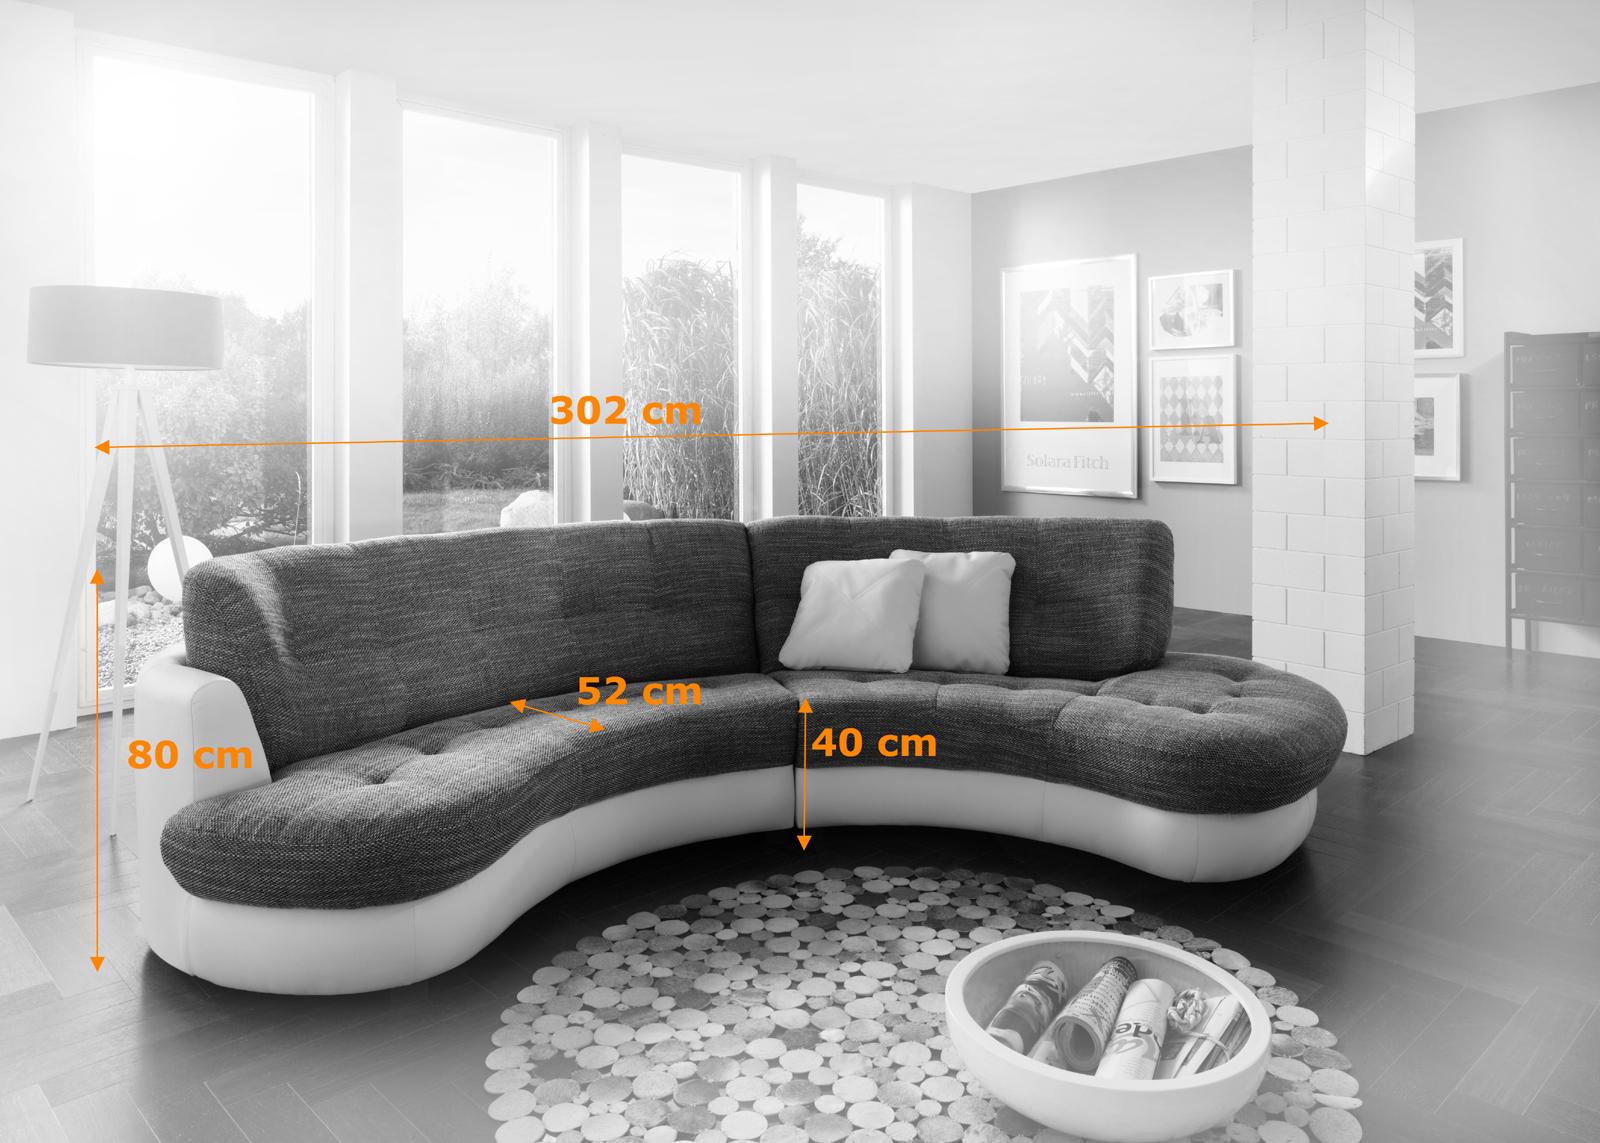 sam ecksofa grau wei 302 cm roma or polsterecke. Black Bedroom Furniture Sets. Home Design Ideas